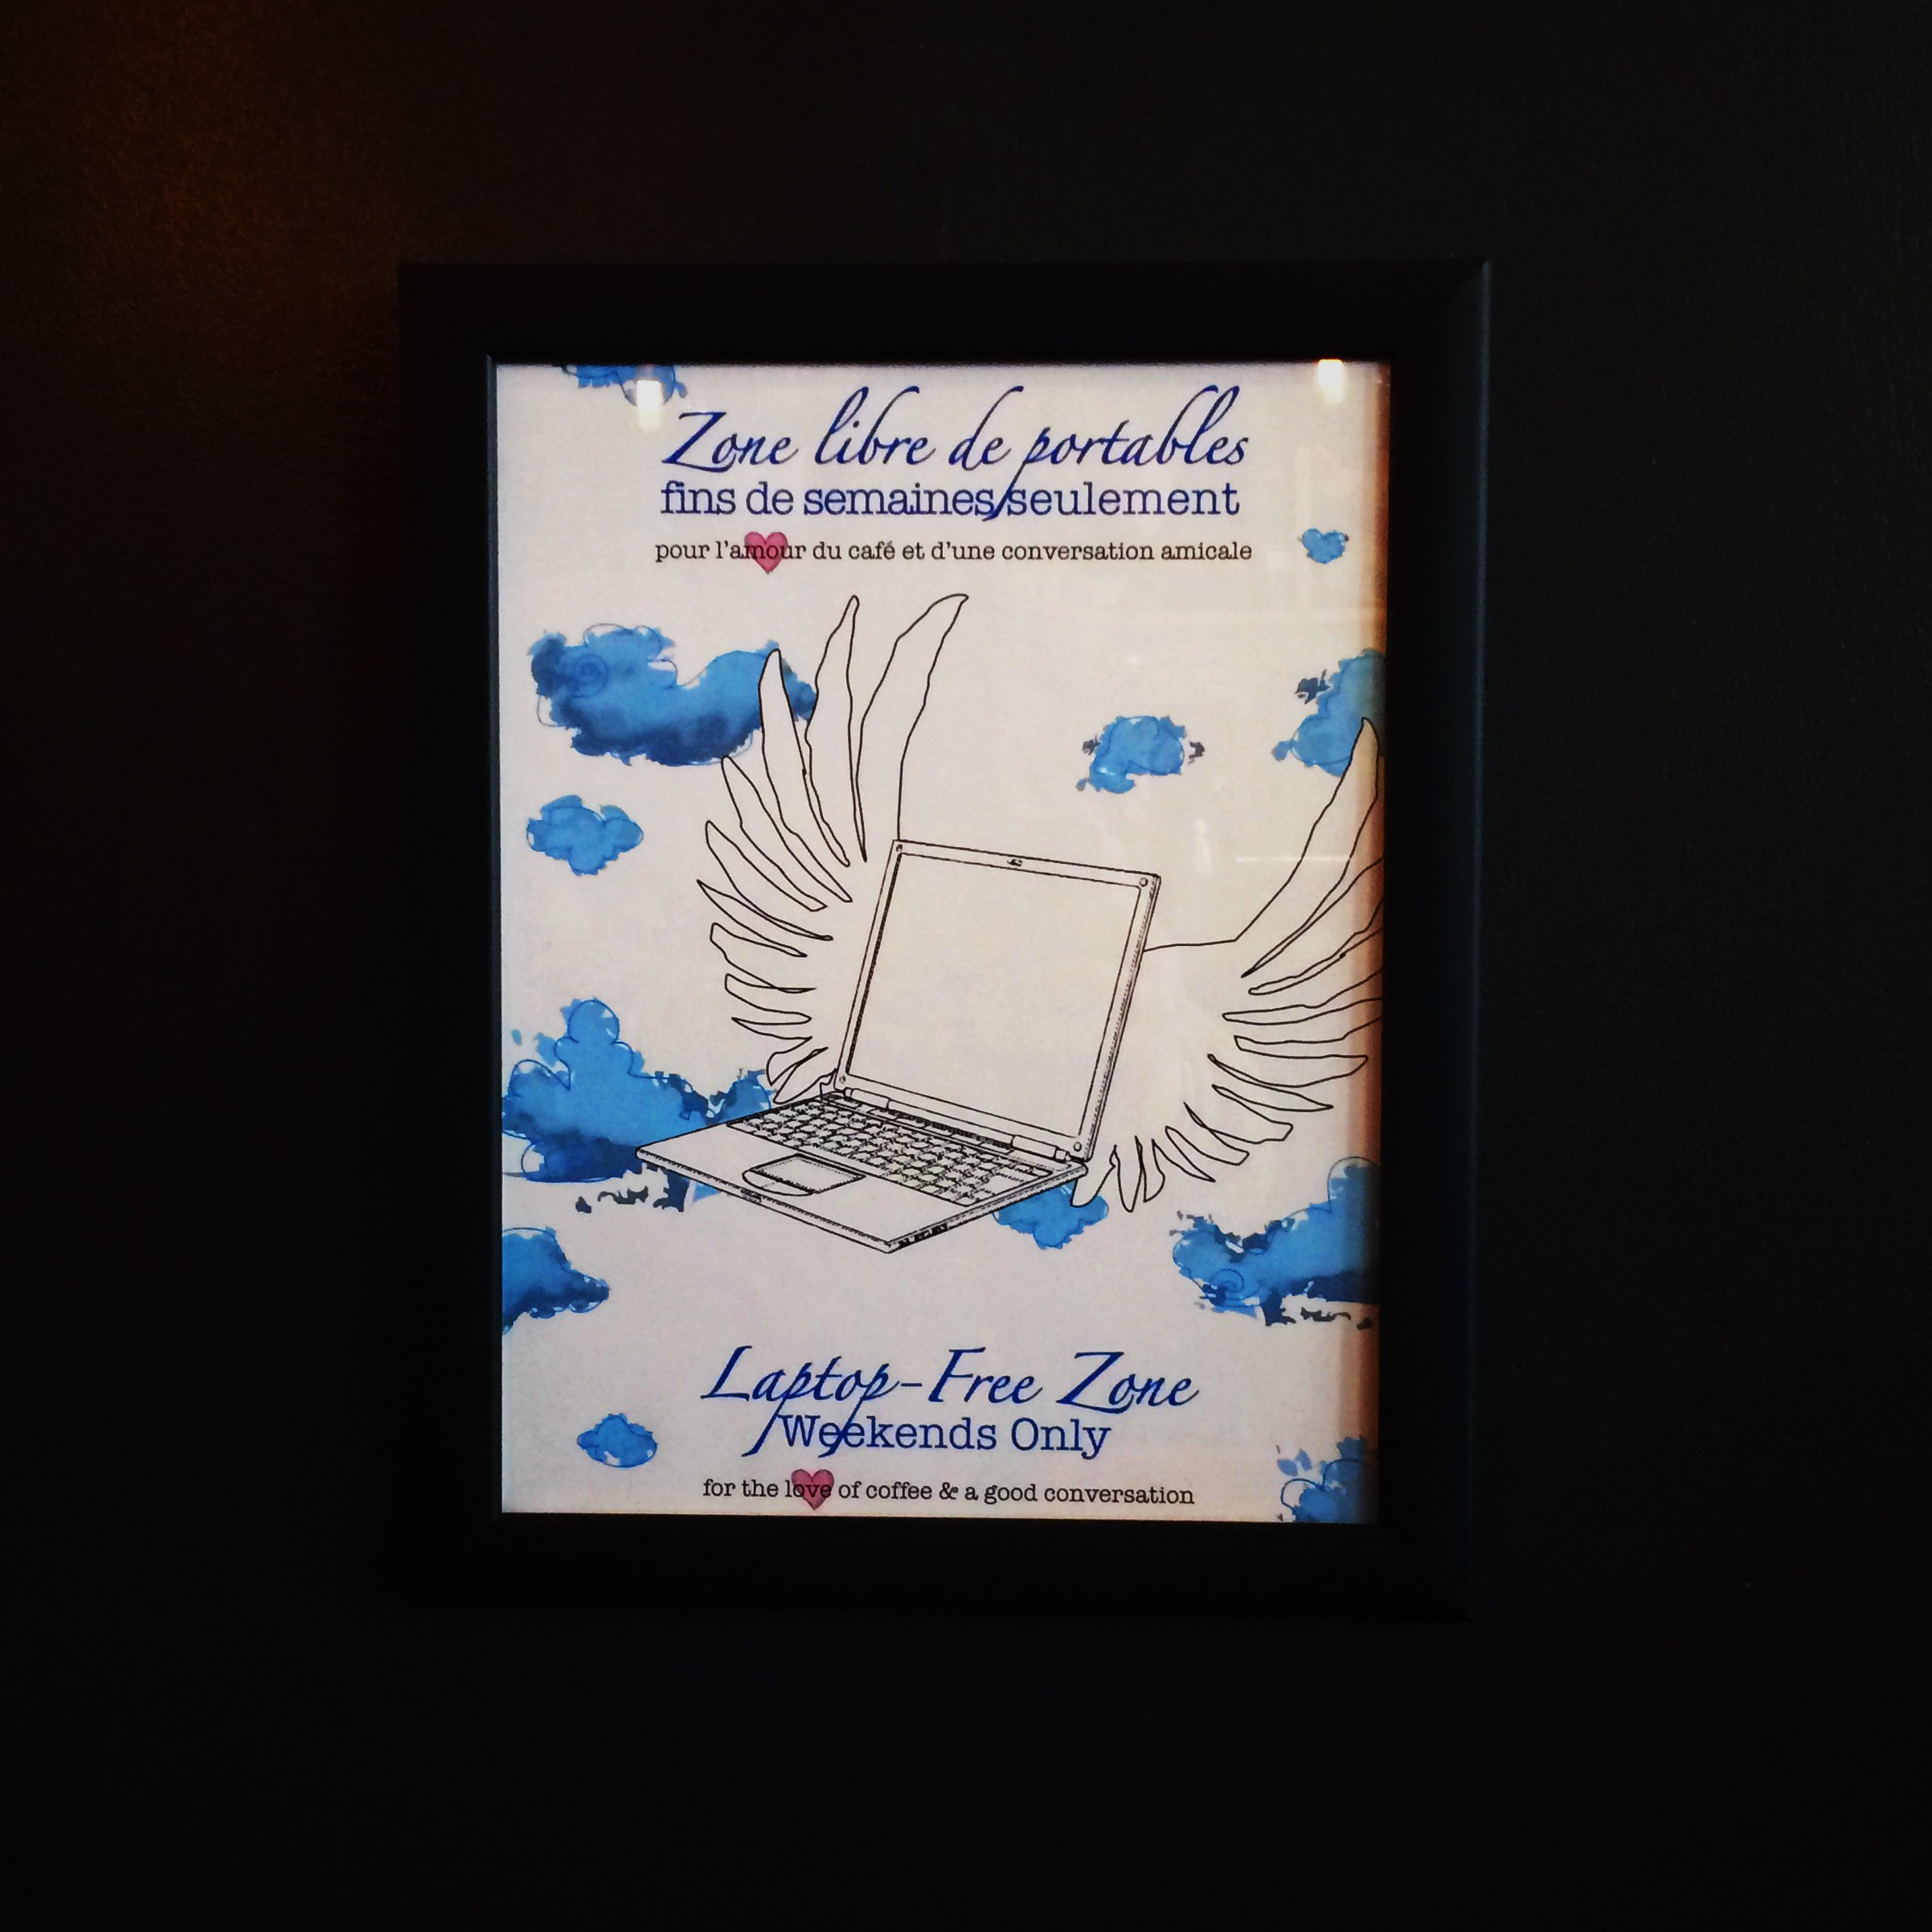 laptopfree